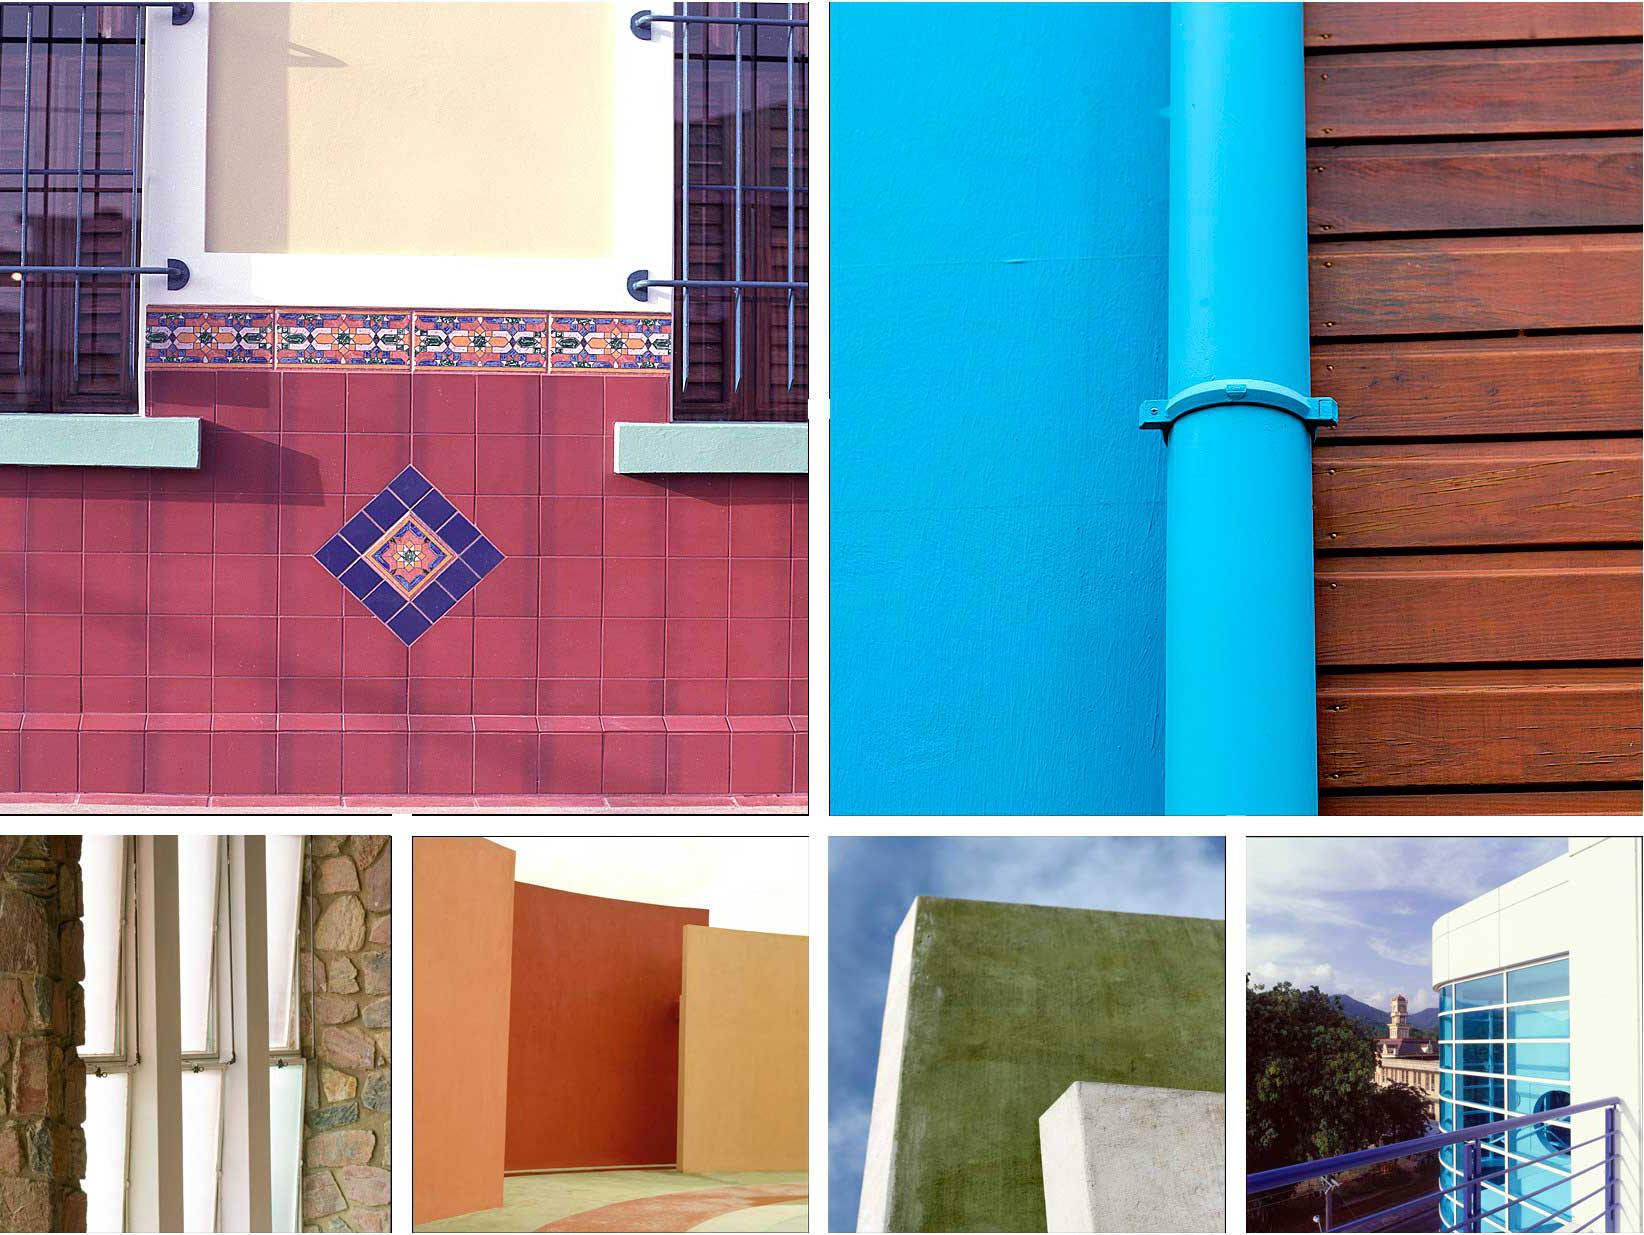 4x3_wall_grid